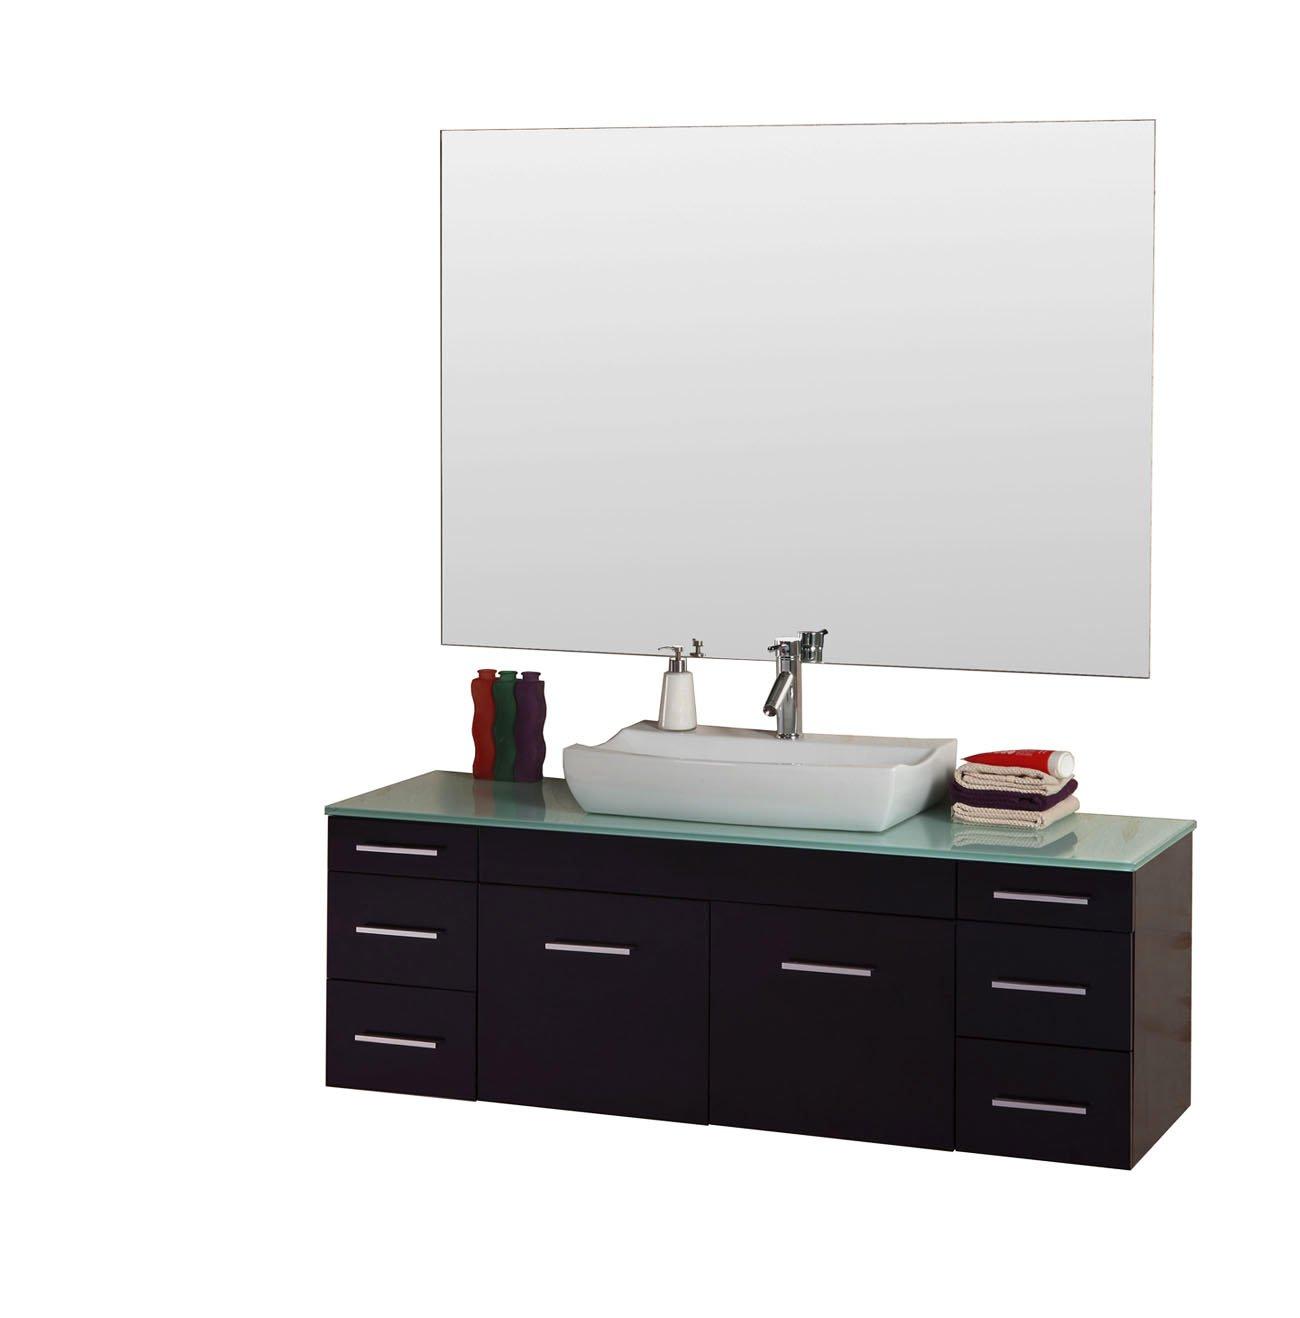 Virtu usa hazel 56 inch single sink bathroom vanity set free - Virtu Usa Um 3083 G Es Biagio 56 Inch Wall Mounted Single Sink Bathroom Vanity Set With Tempered Glass Countertop Espresso Finish Amazon Com